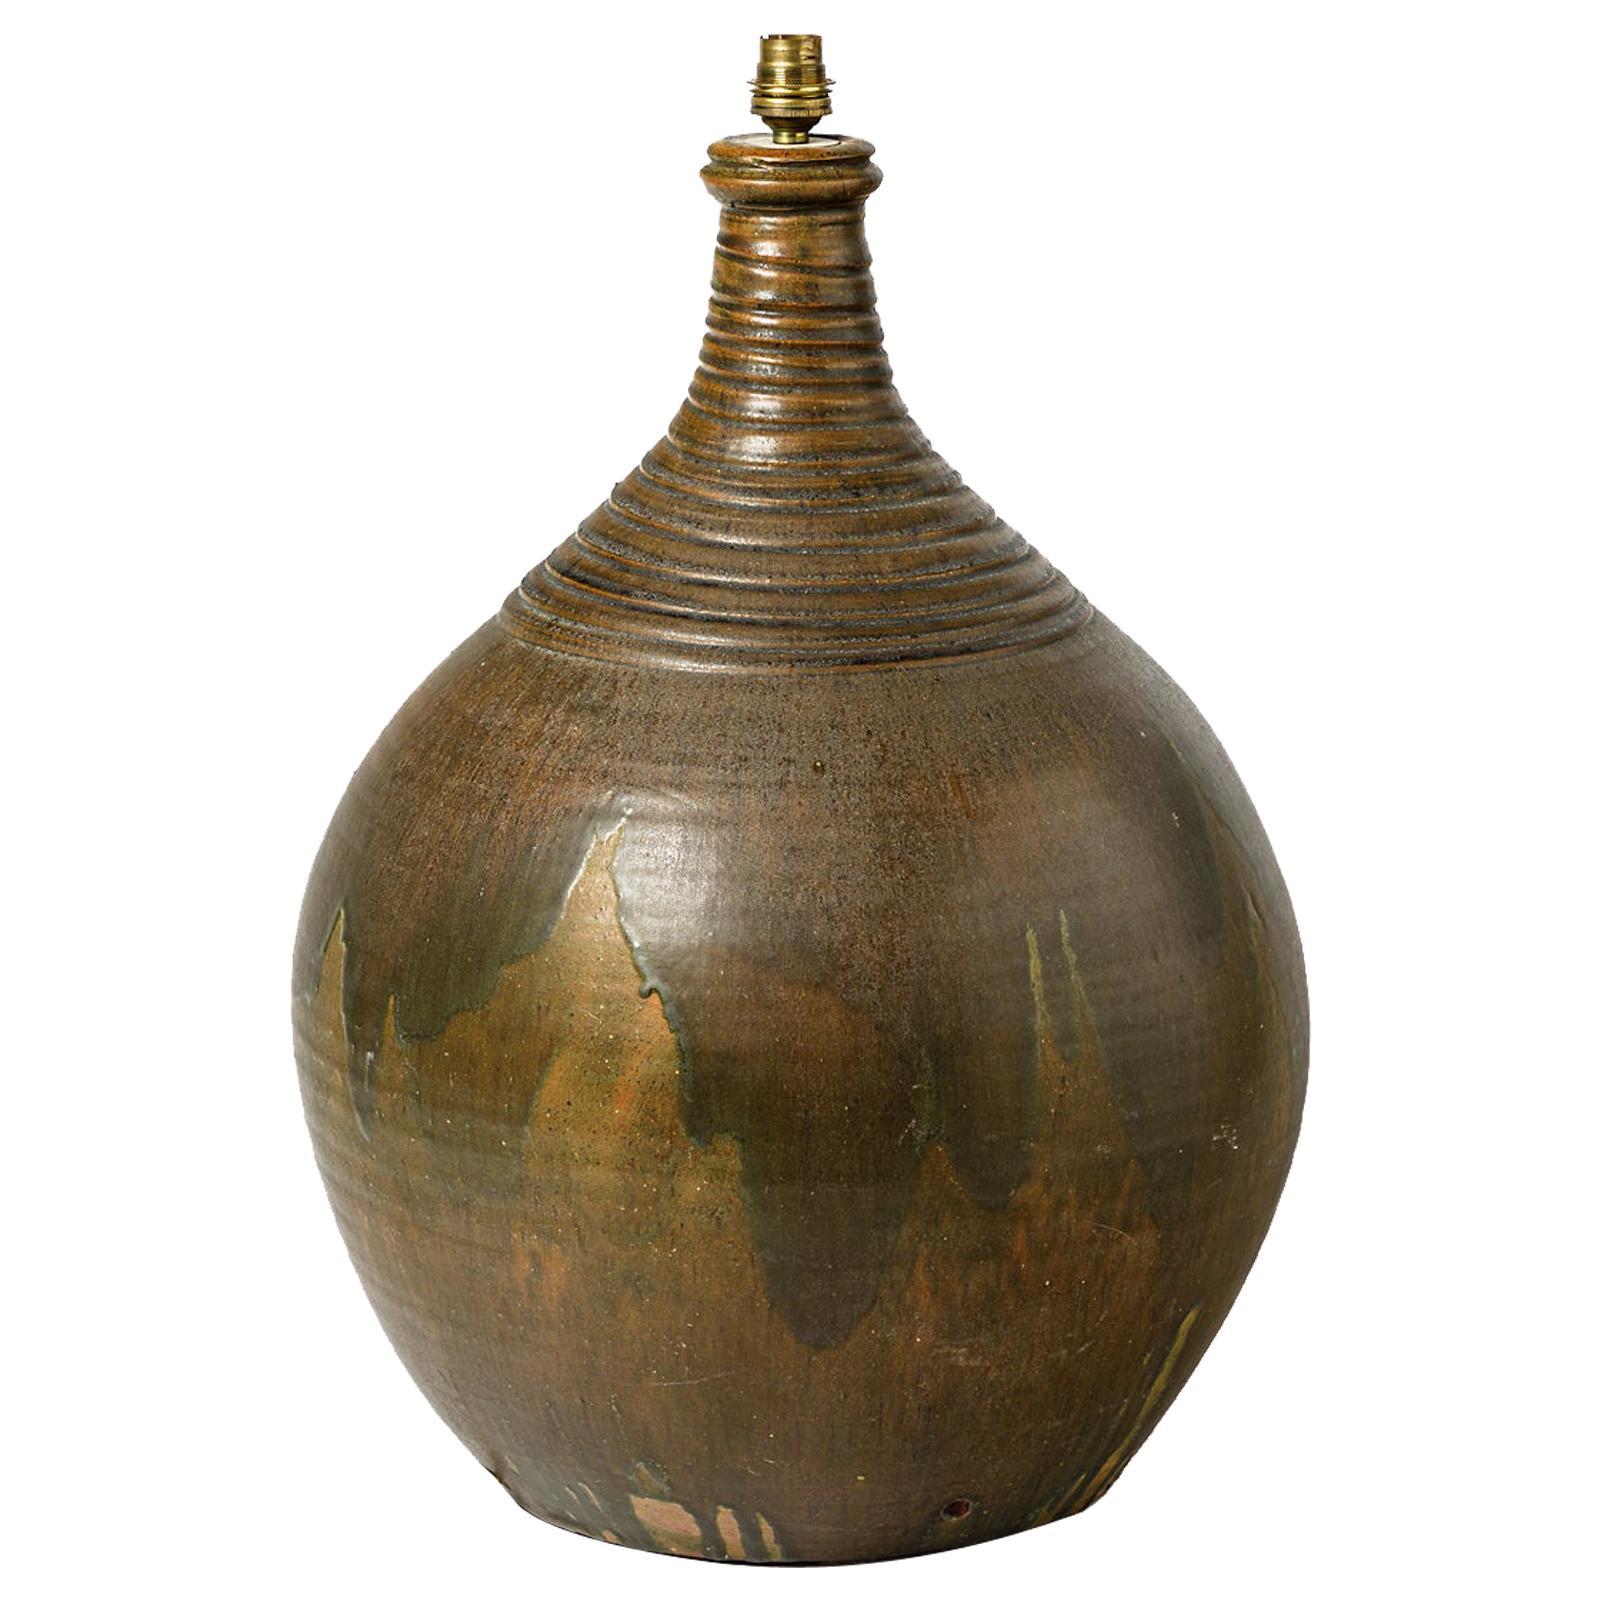 Large Stoneware Floor or Table Ceramic Lamp Brown Color circa 1950 La Borne